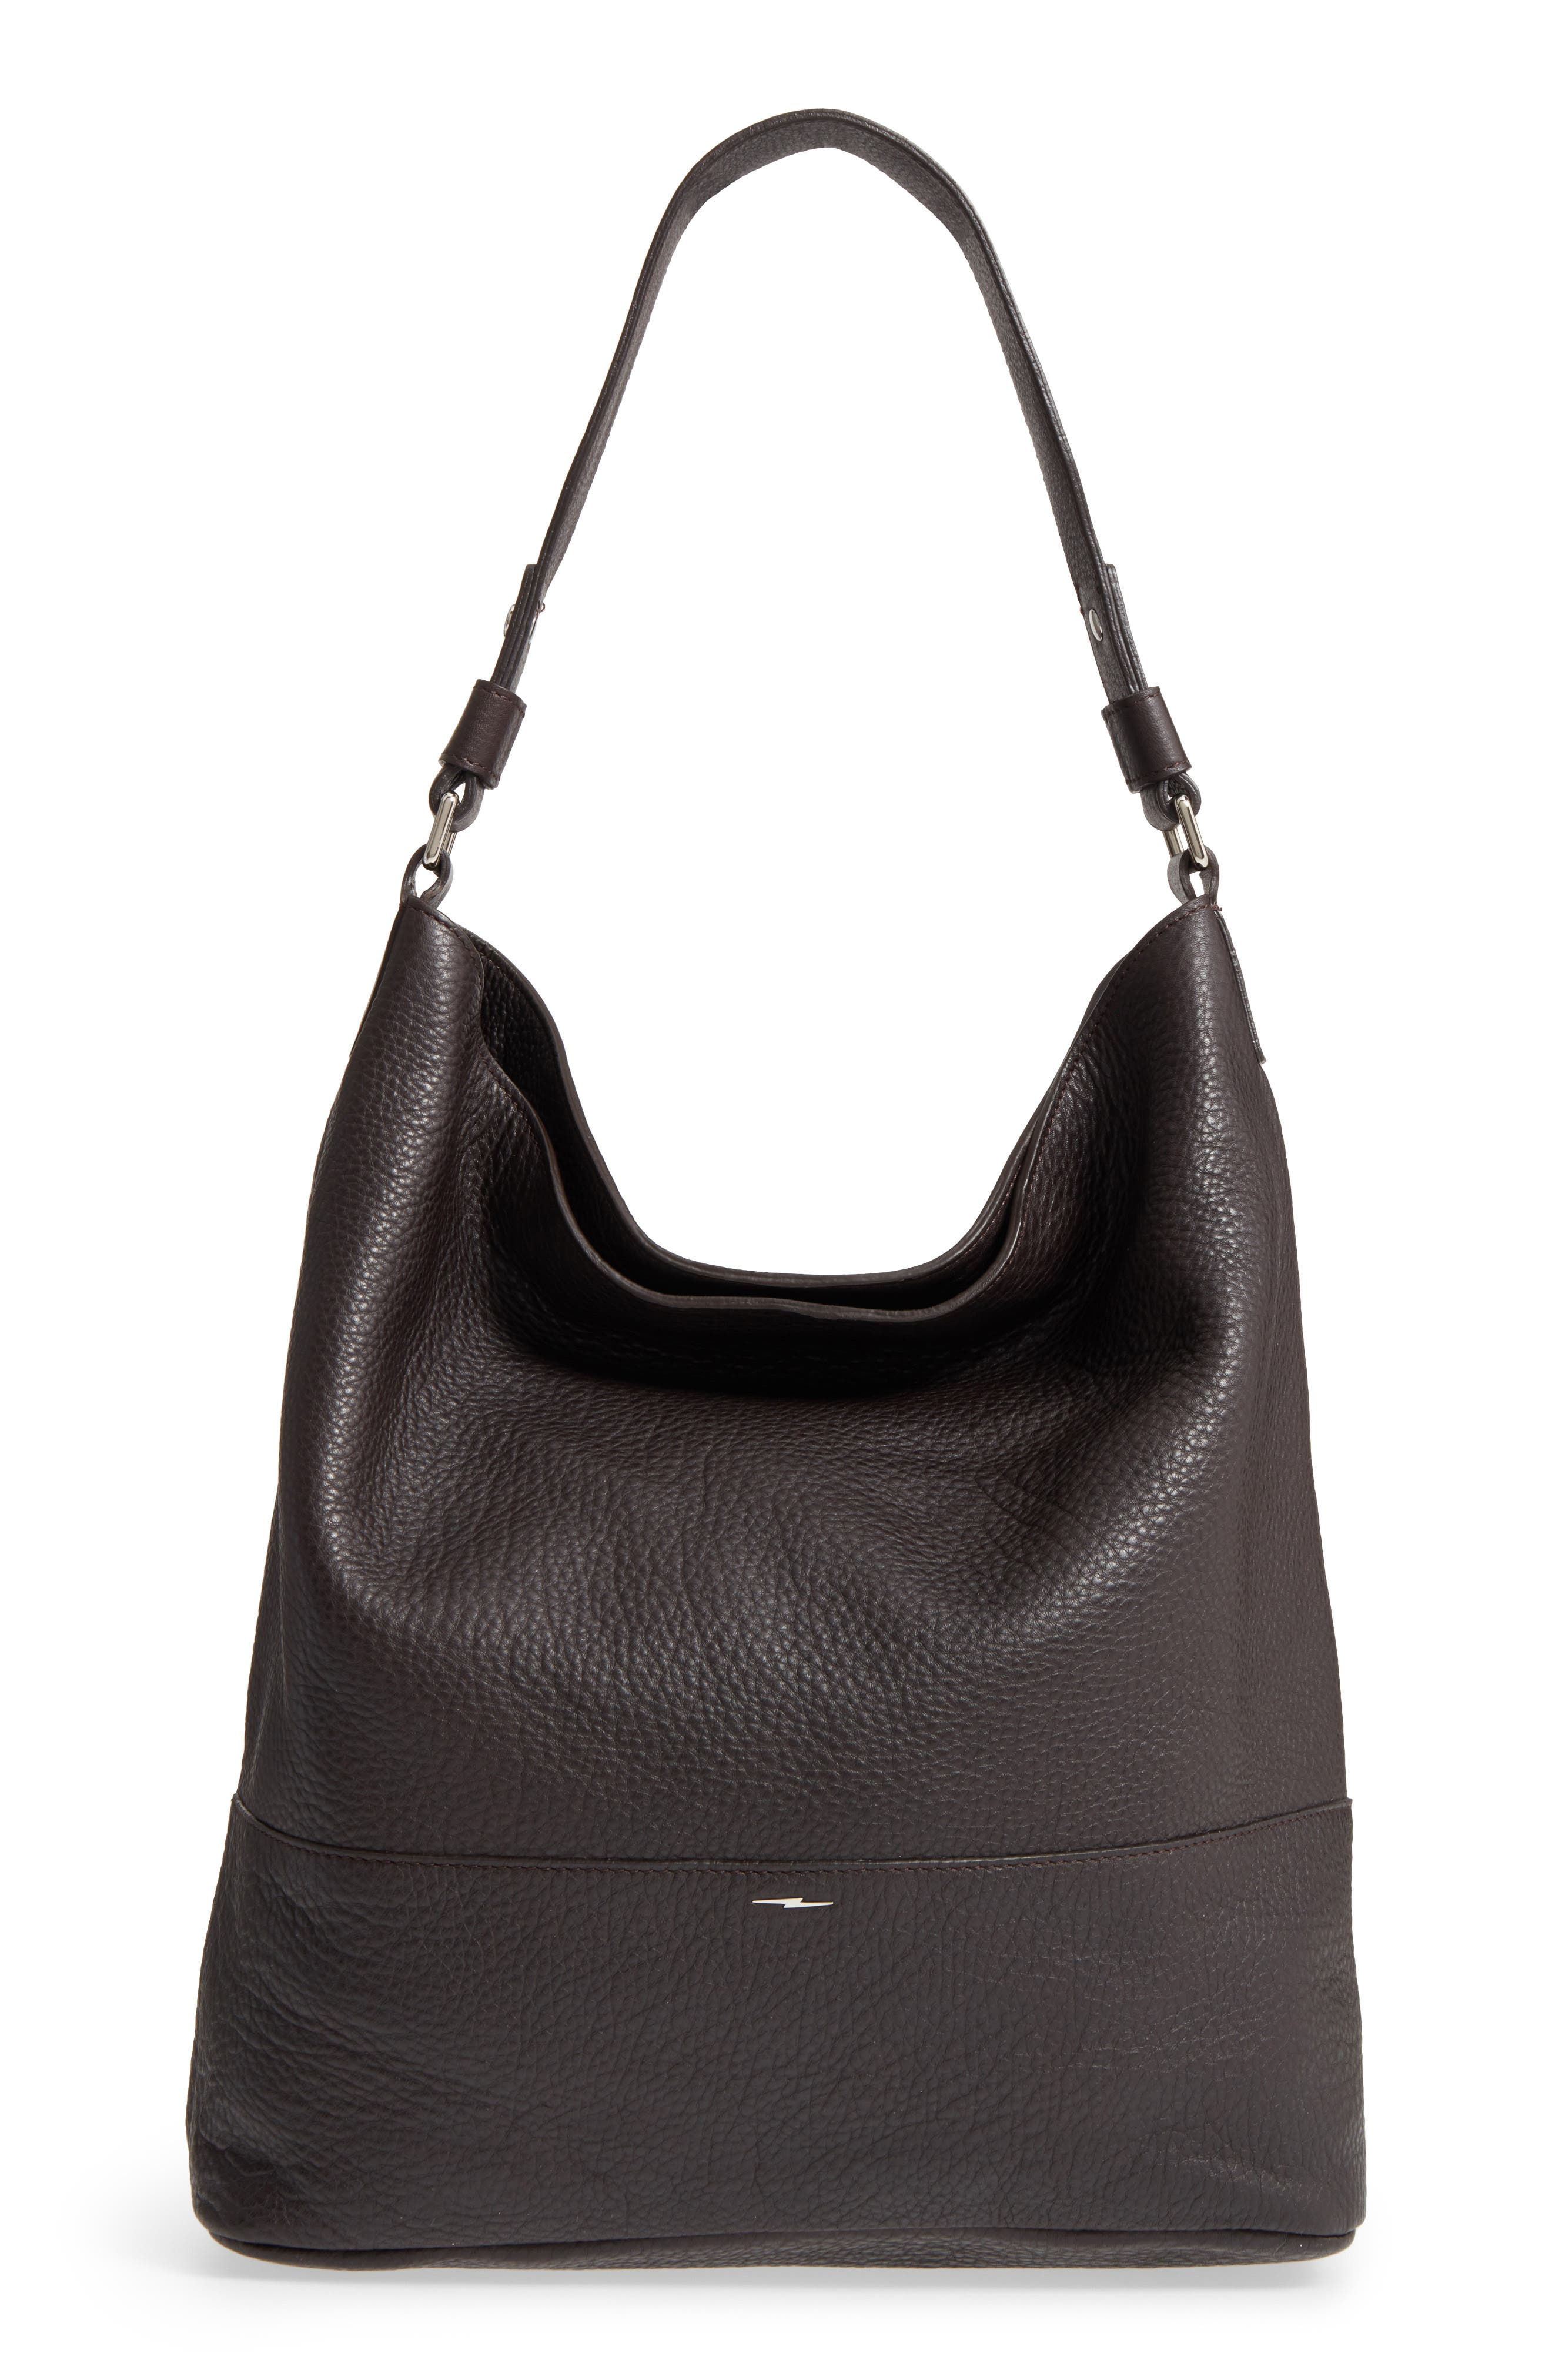 SHINOLA,                             Relaxed Calfskin Leather Hobo Bag,                             Main thumbnail 1, color,                             240